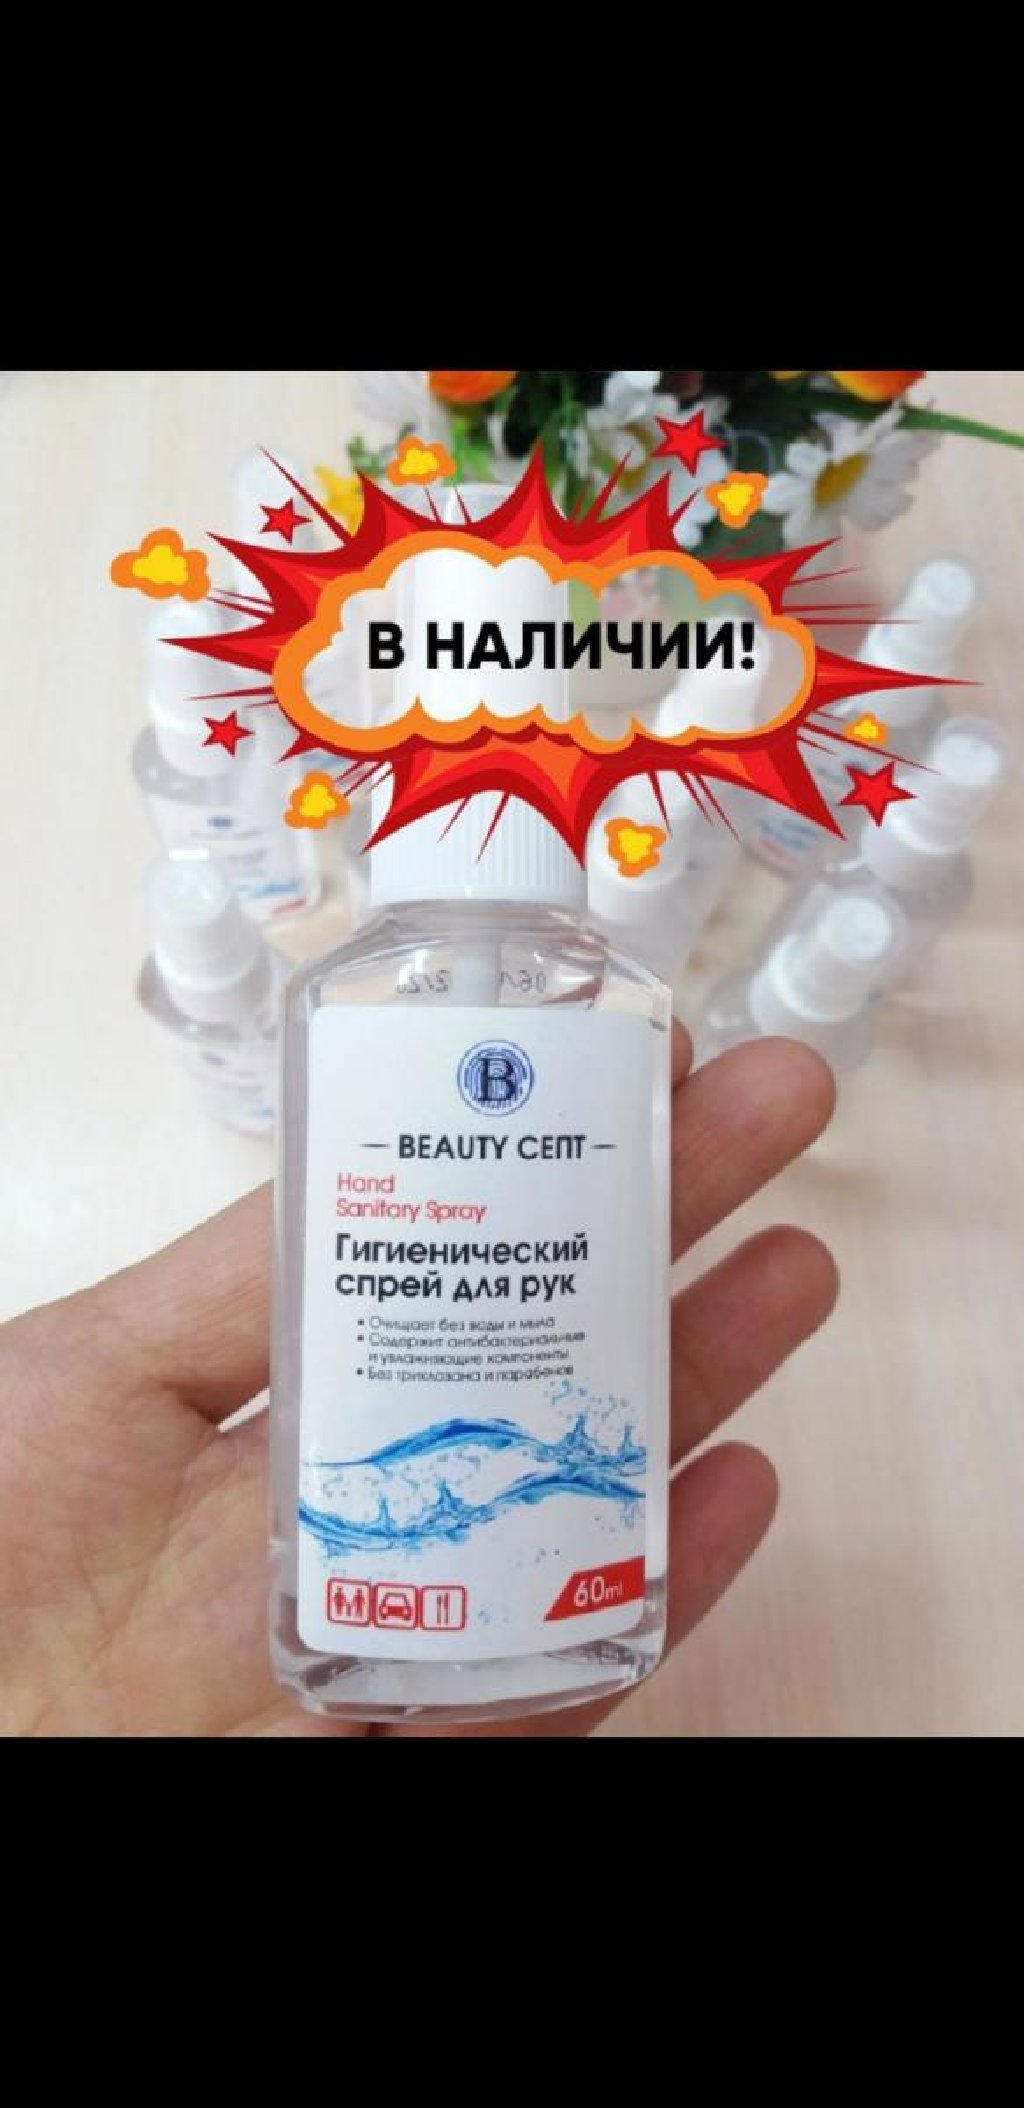 Антисептик Beauty Септ 60мл. Оптом и в розницу